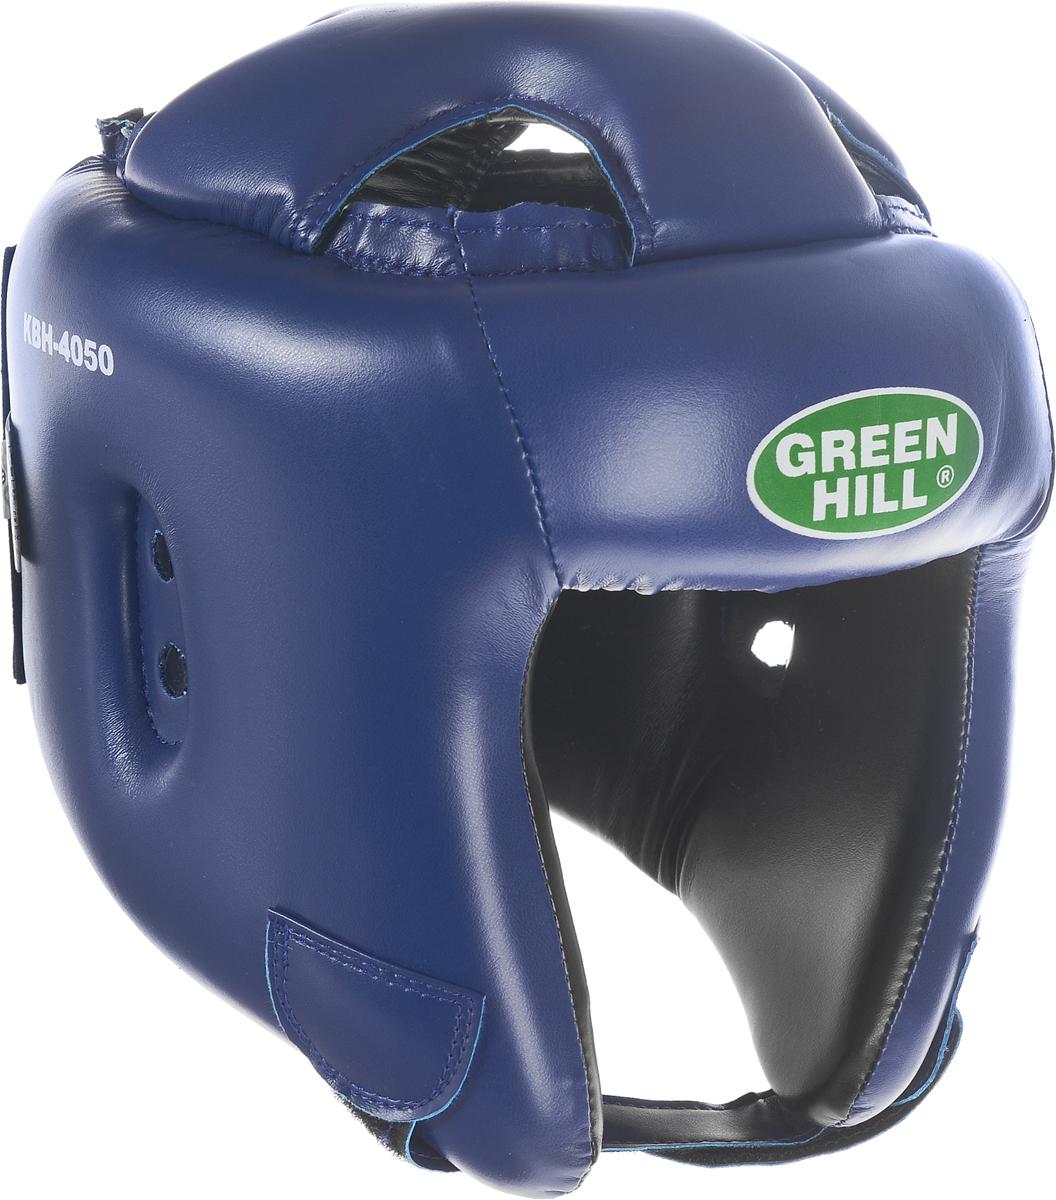 "Шлем боксерский Green Hill ""Brave"", цвет: синий. Размер S (48-53 см) KBH-4050"